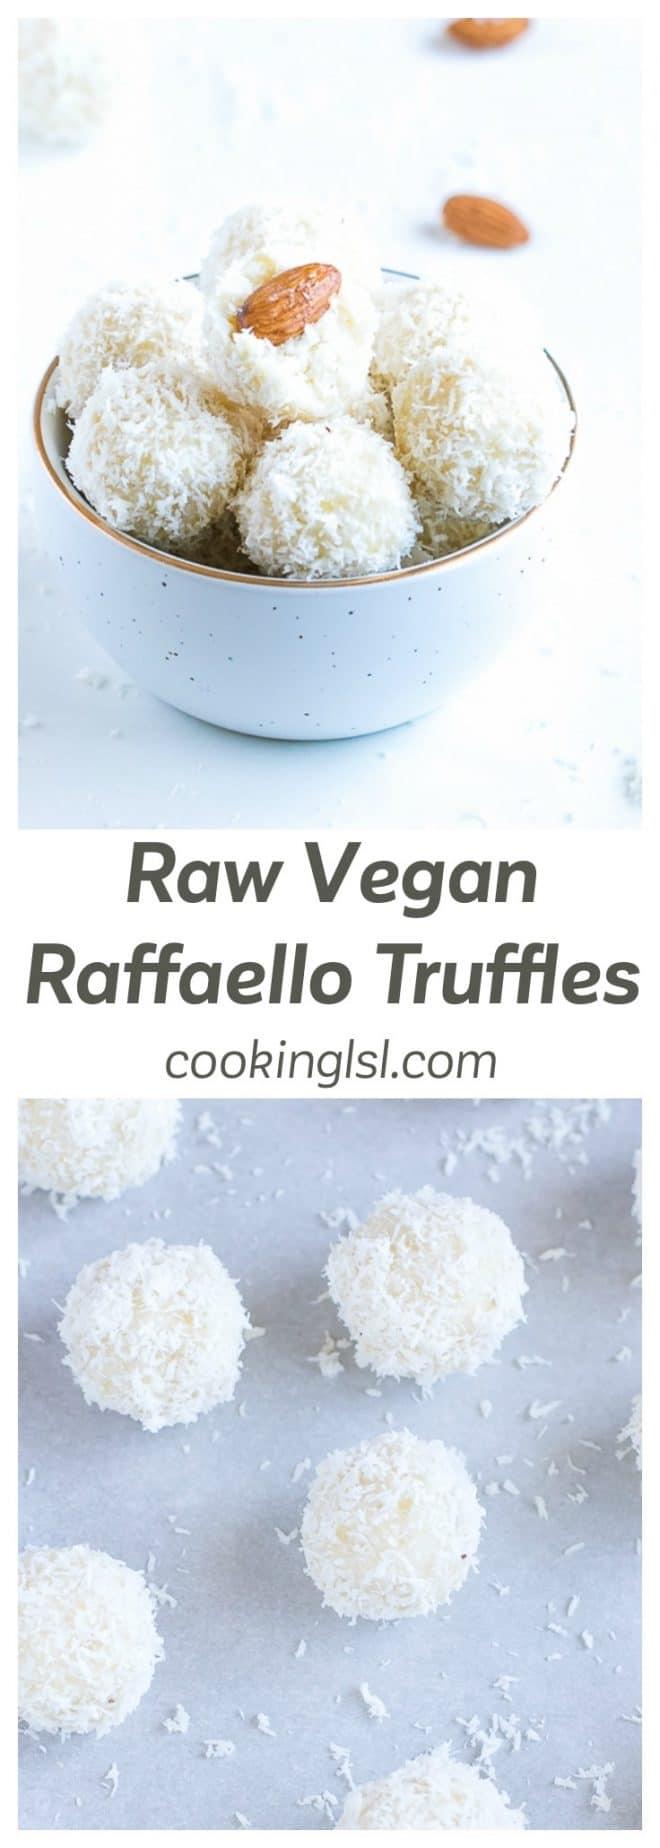 Raw Vegan Raffaello Truffles Recipe